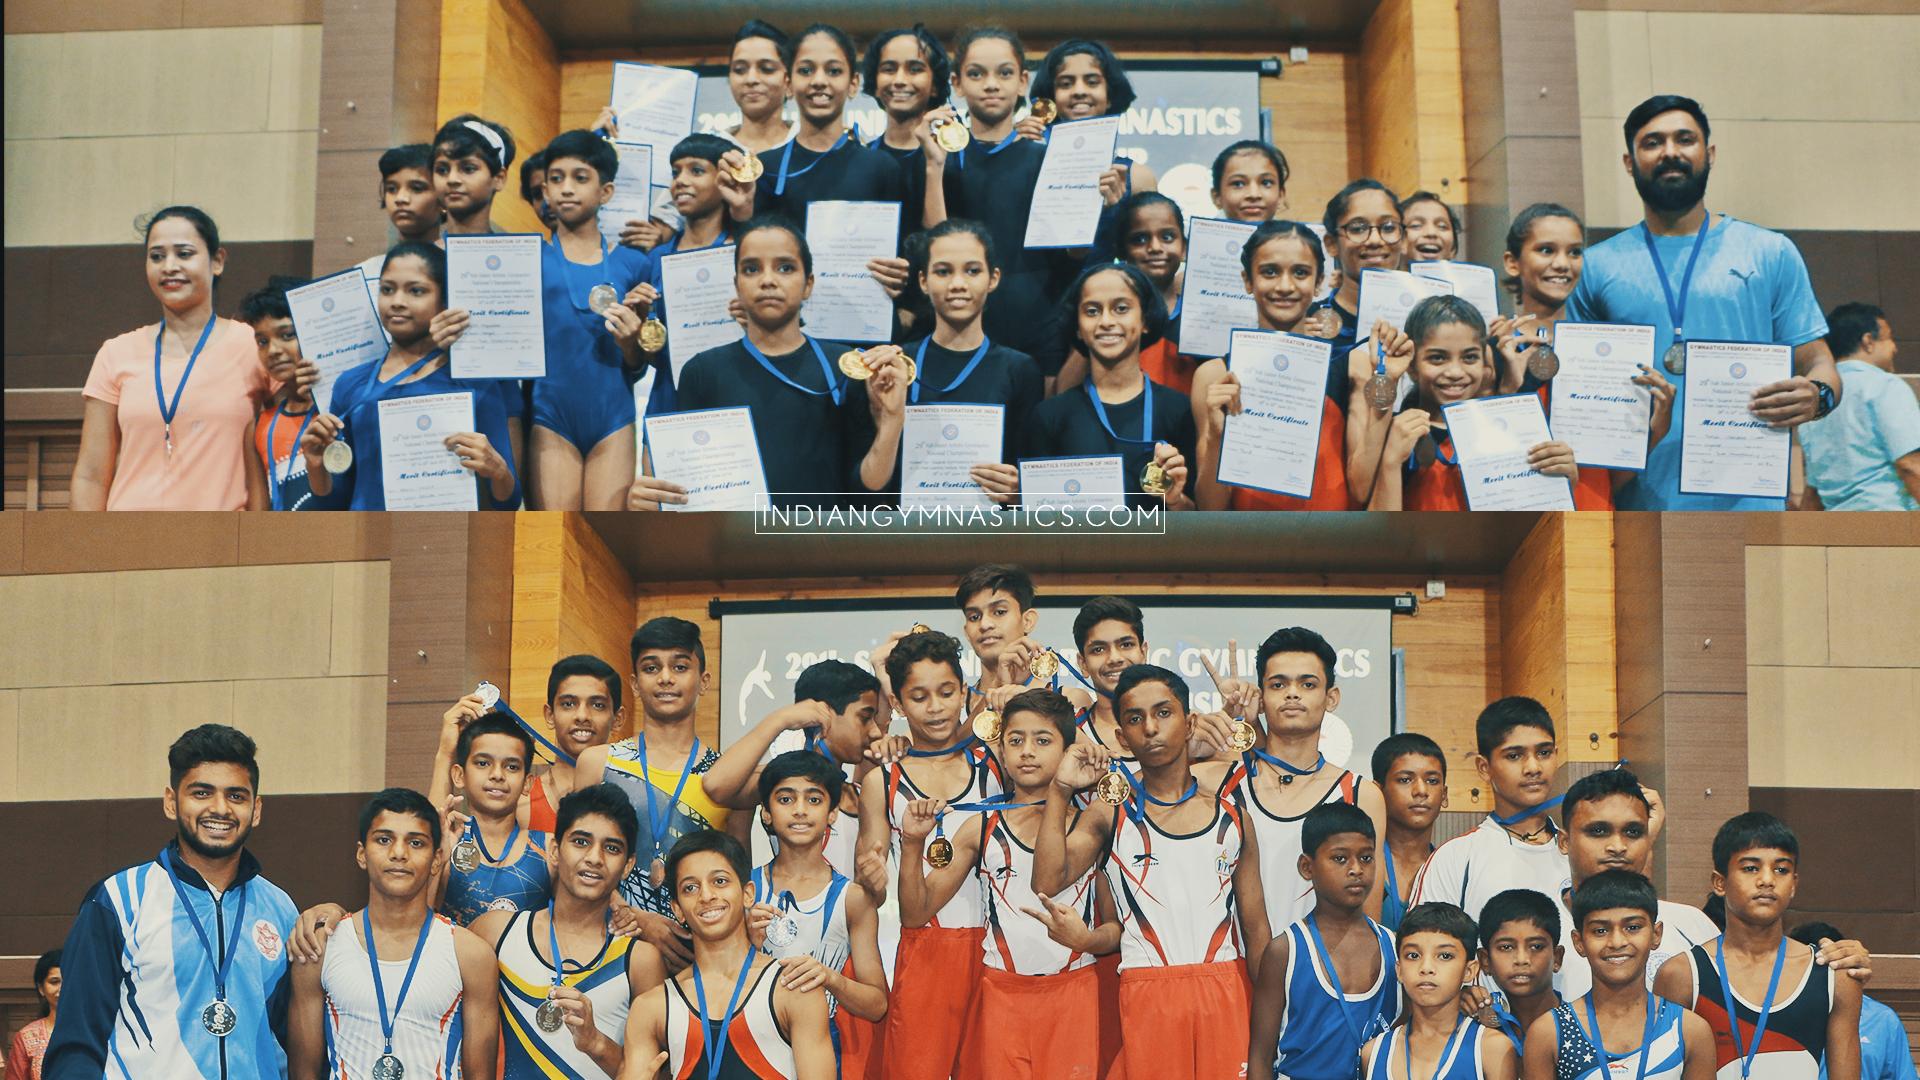 Events - Indian Gymnastics